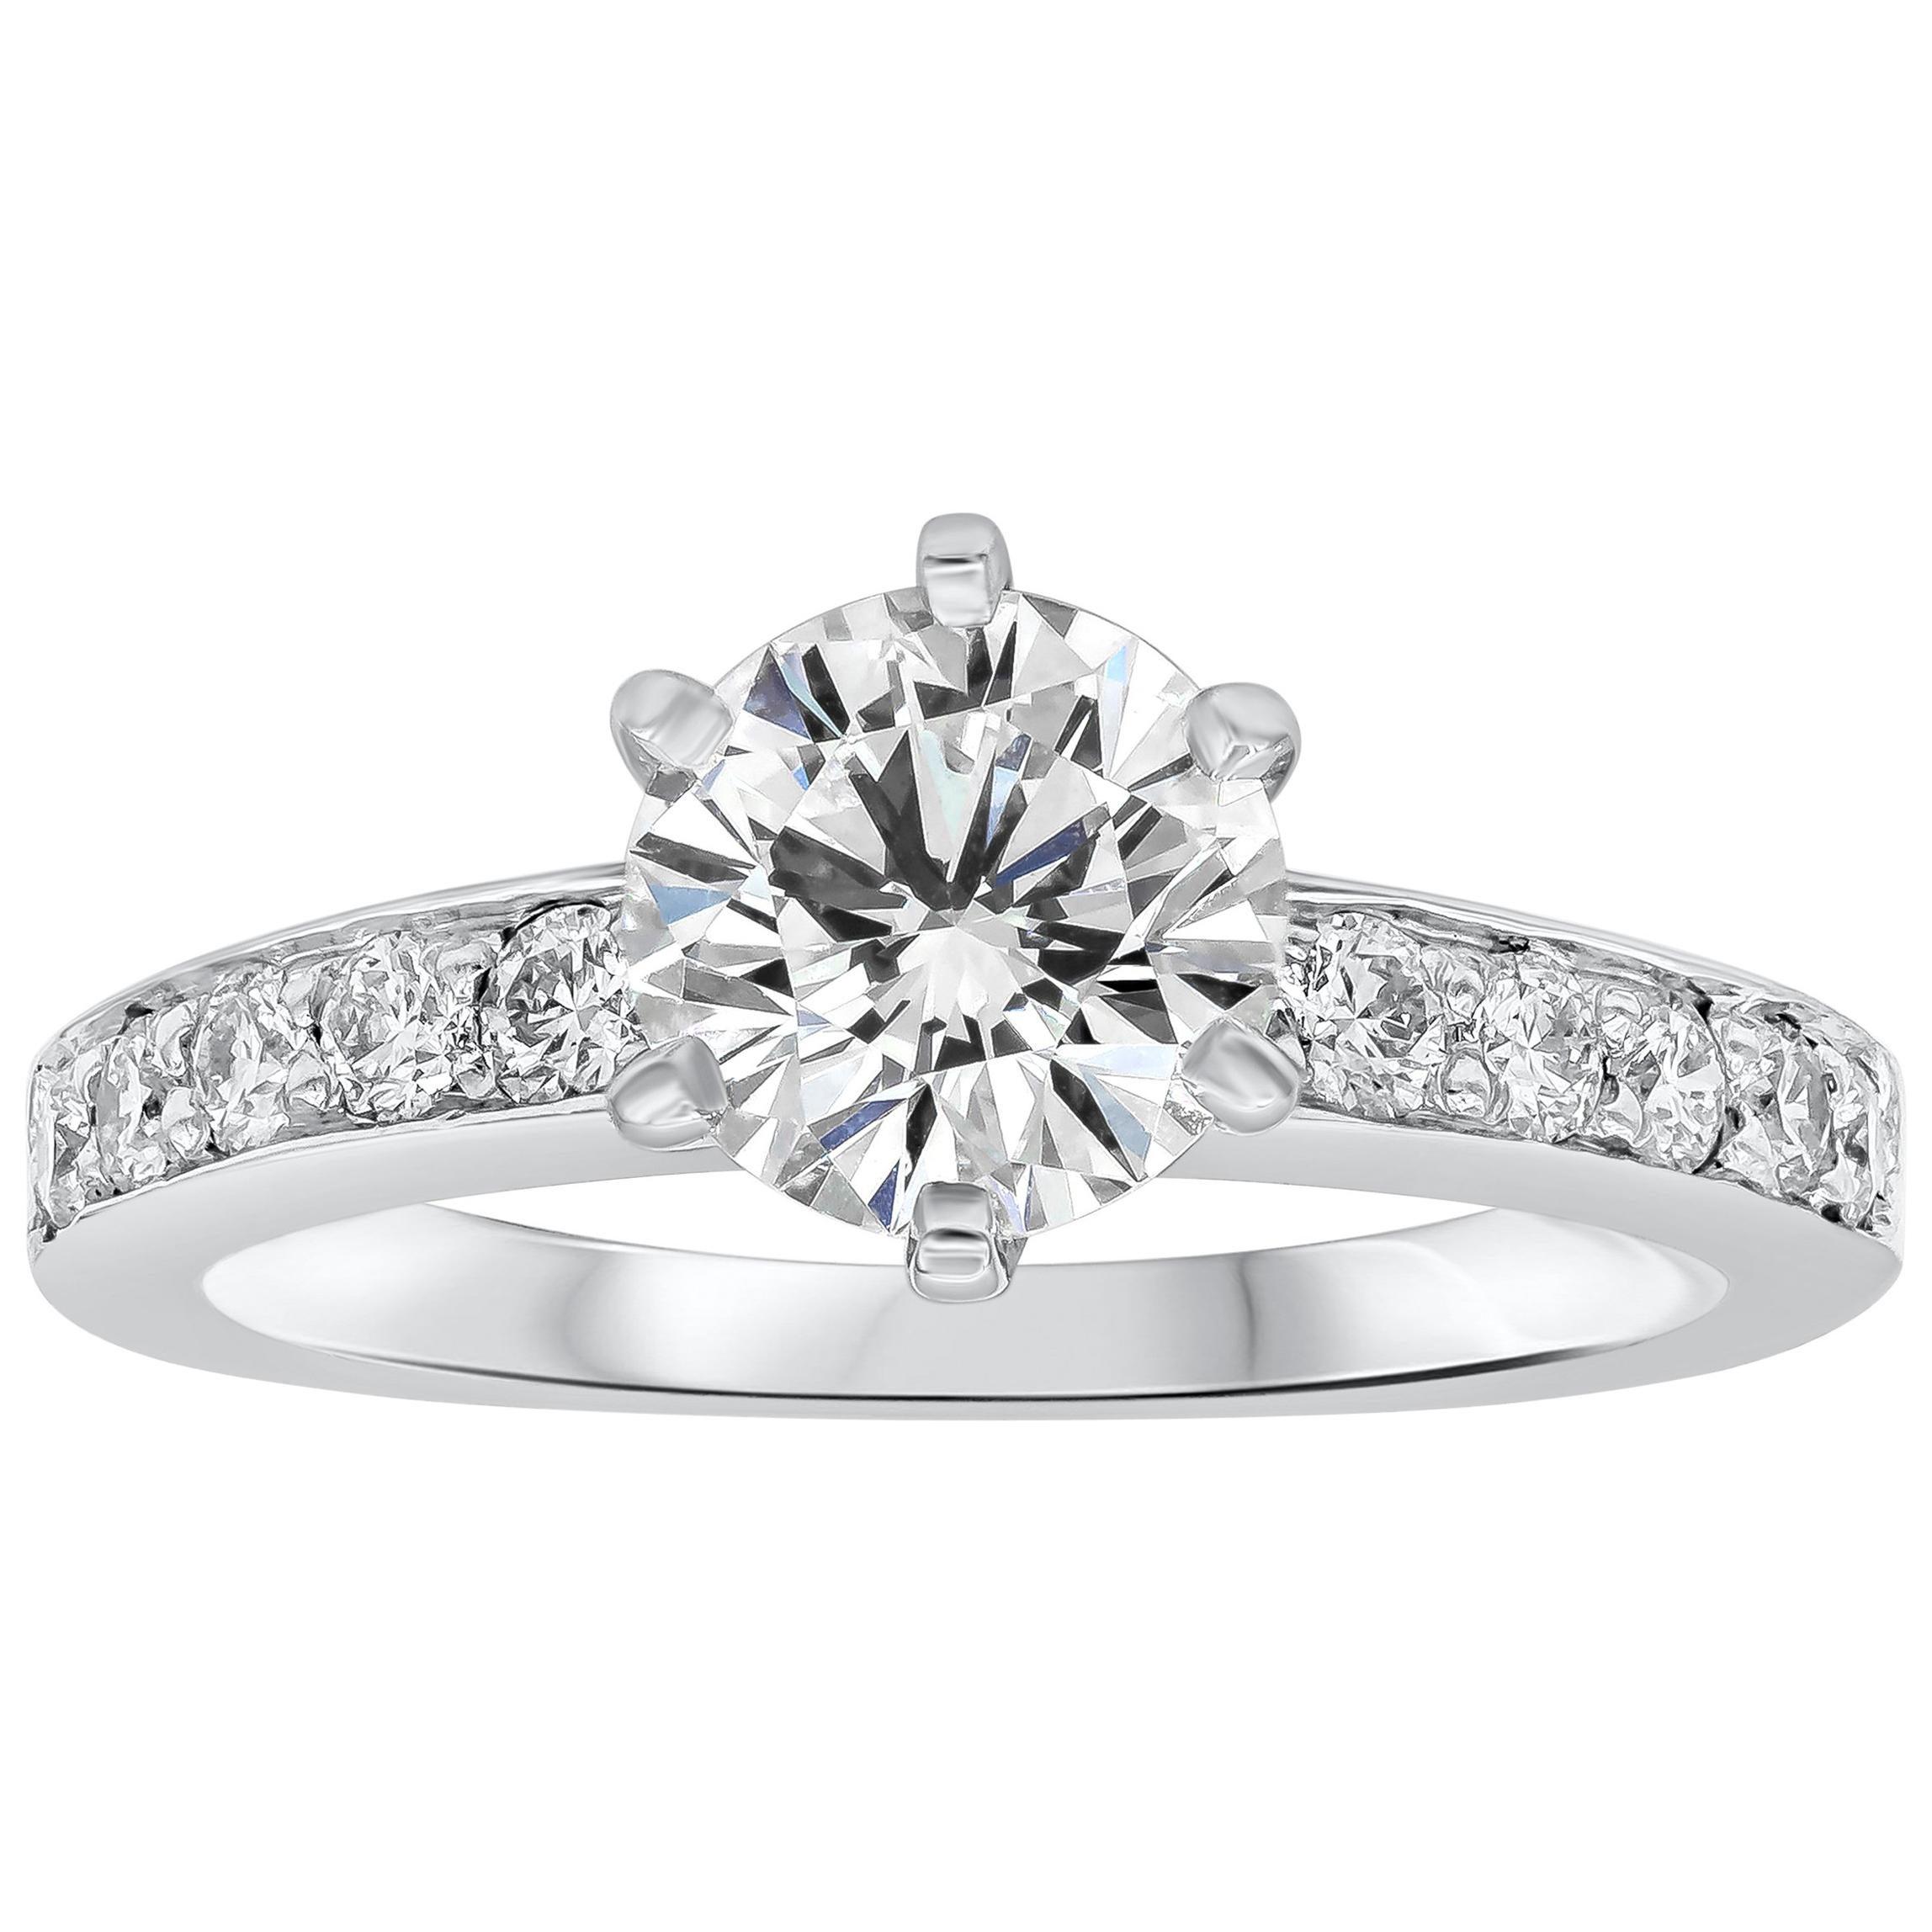 Tiffany & Co. 1.01 Carat Round Diamond Platinum Engagement Solitaire Ring